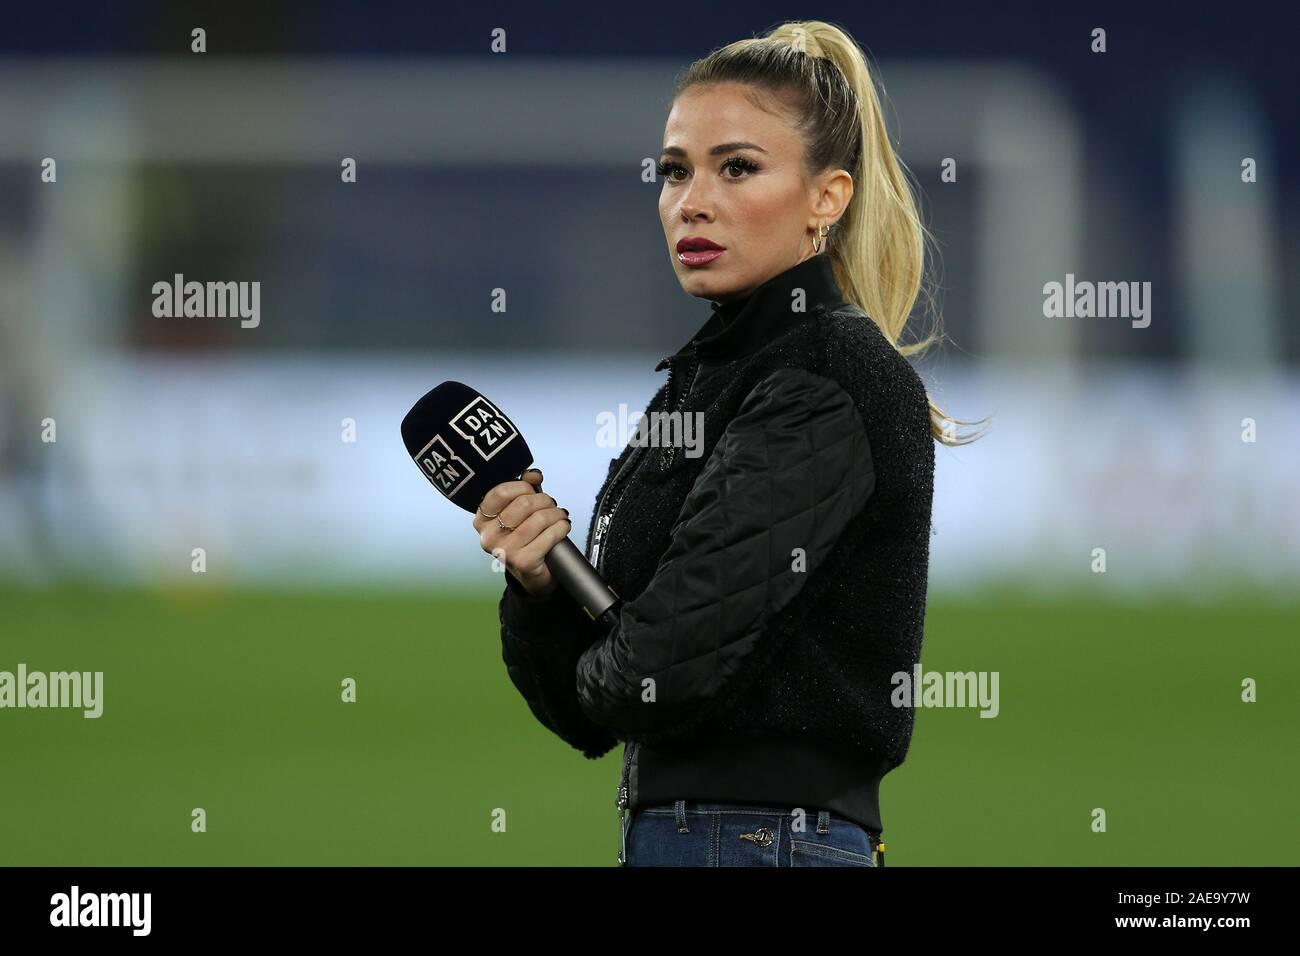 Rome Italy 07th Dec 2019 Tv Presenter Diletta Leotta During The Serie A Tim Match Between